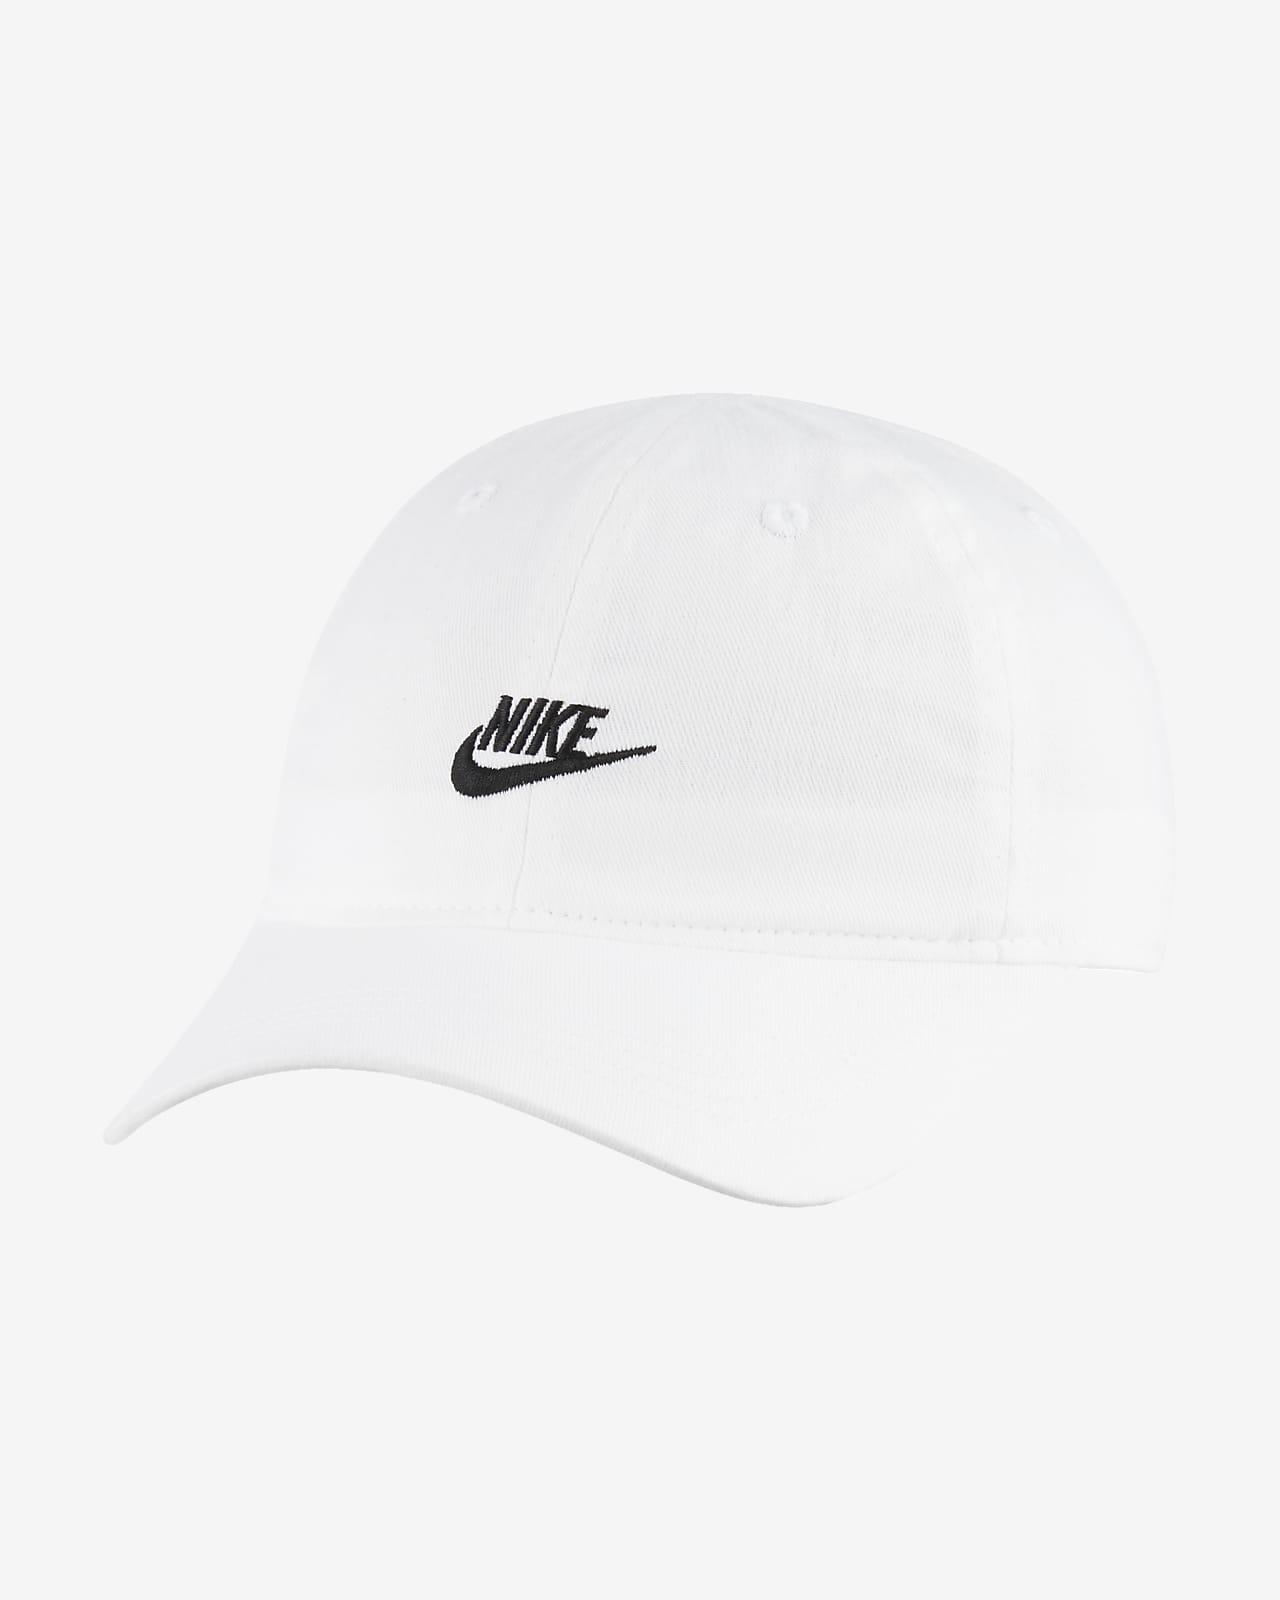 Gorra ajustable para niños talla pequeña Nike